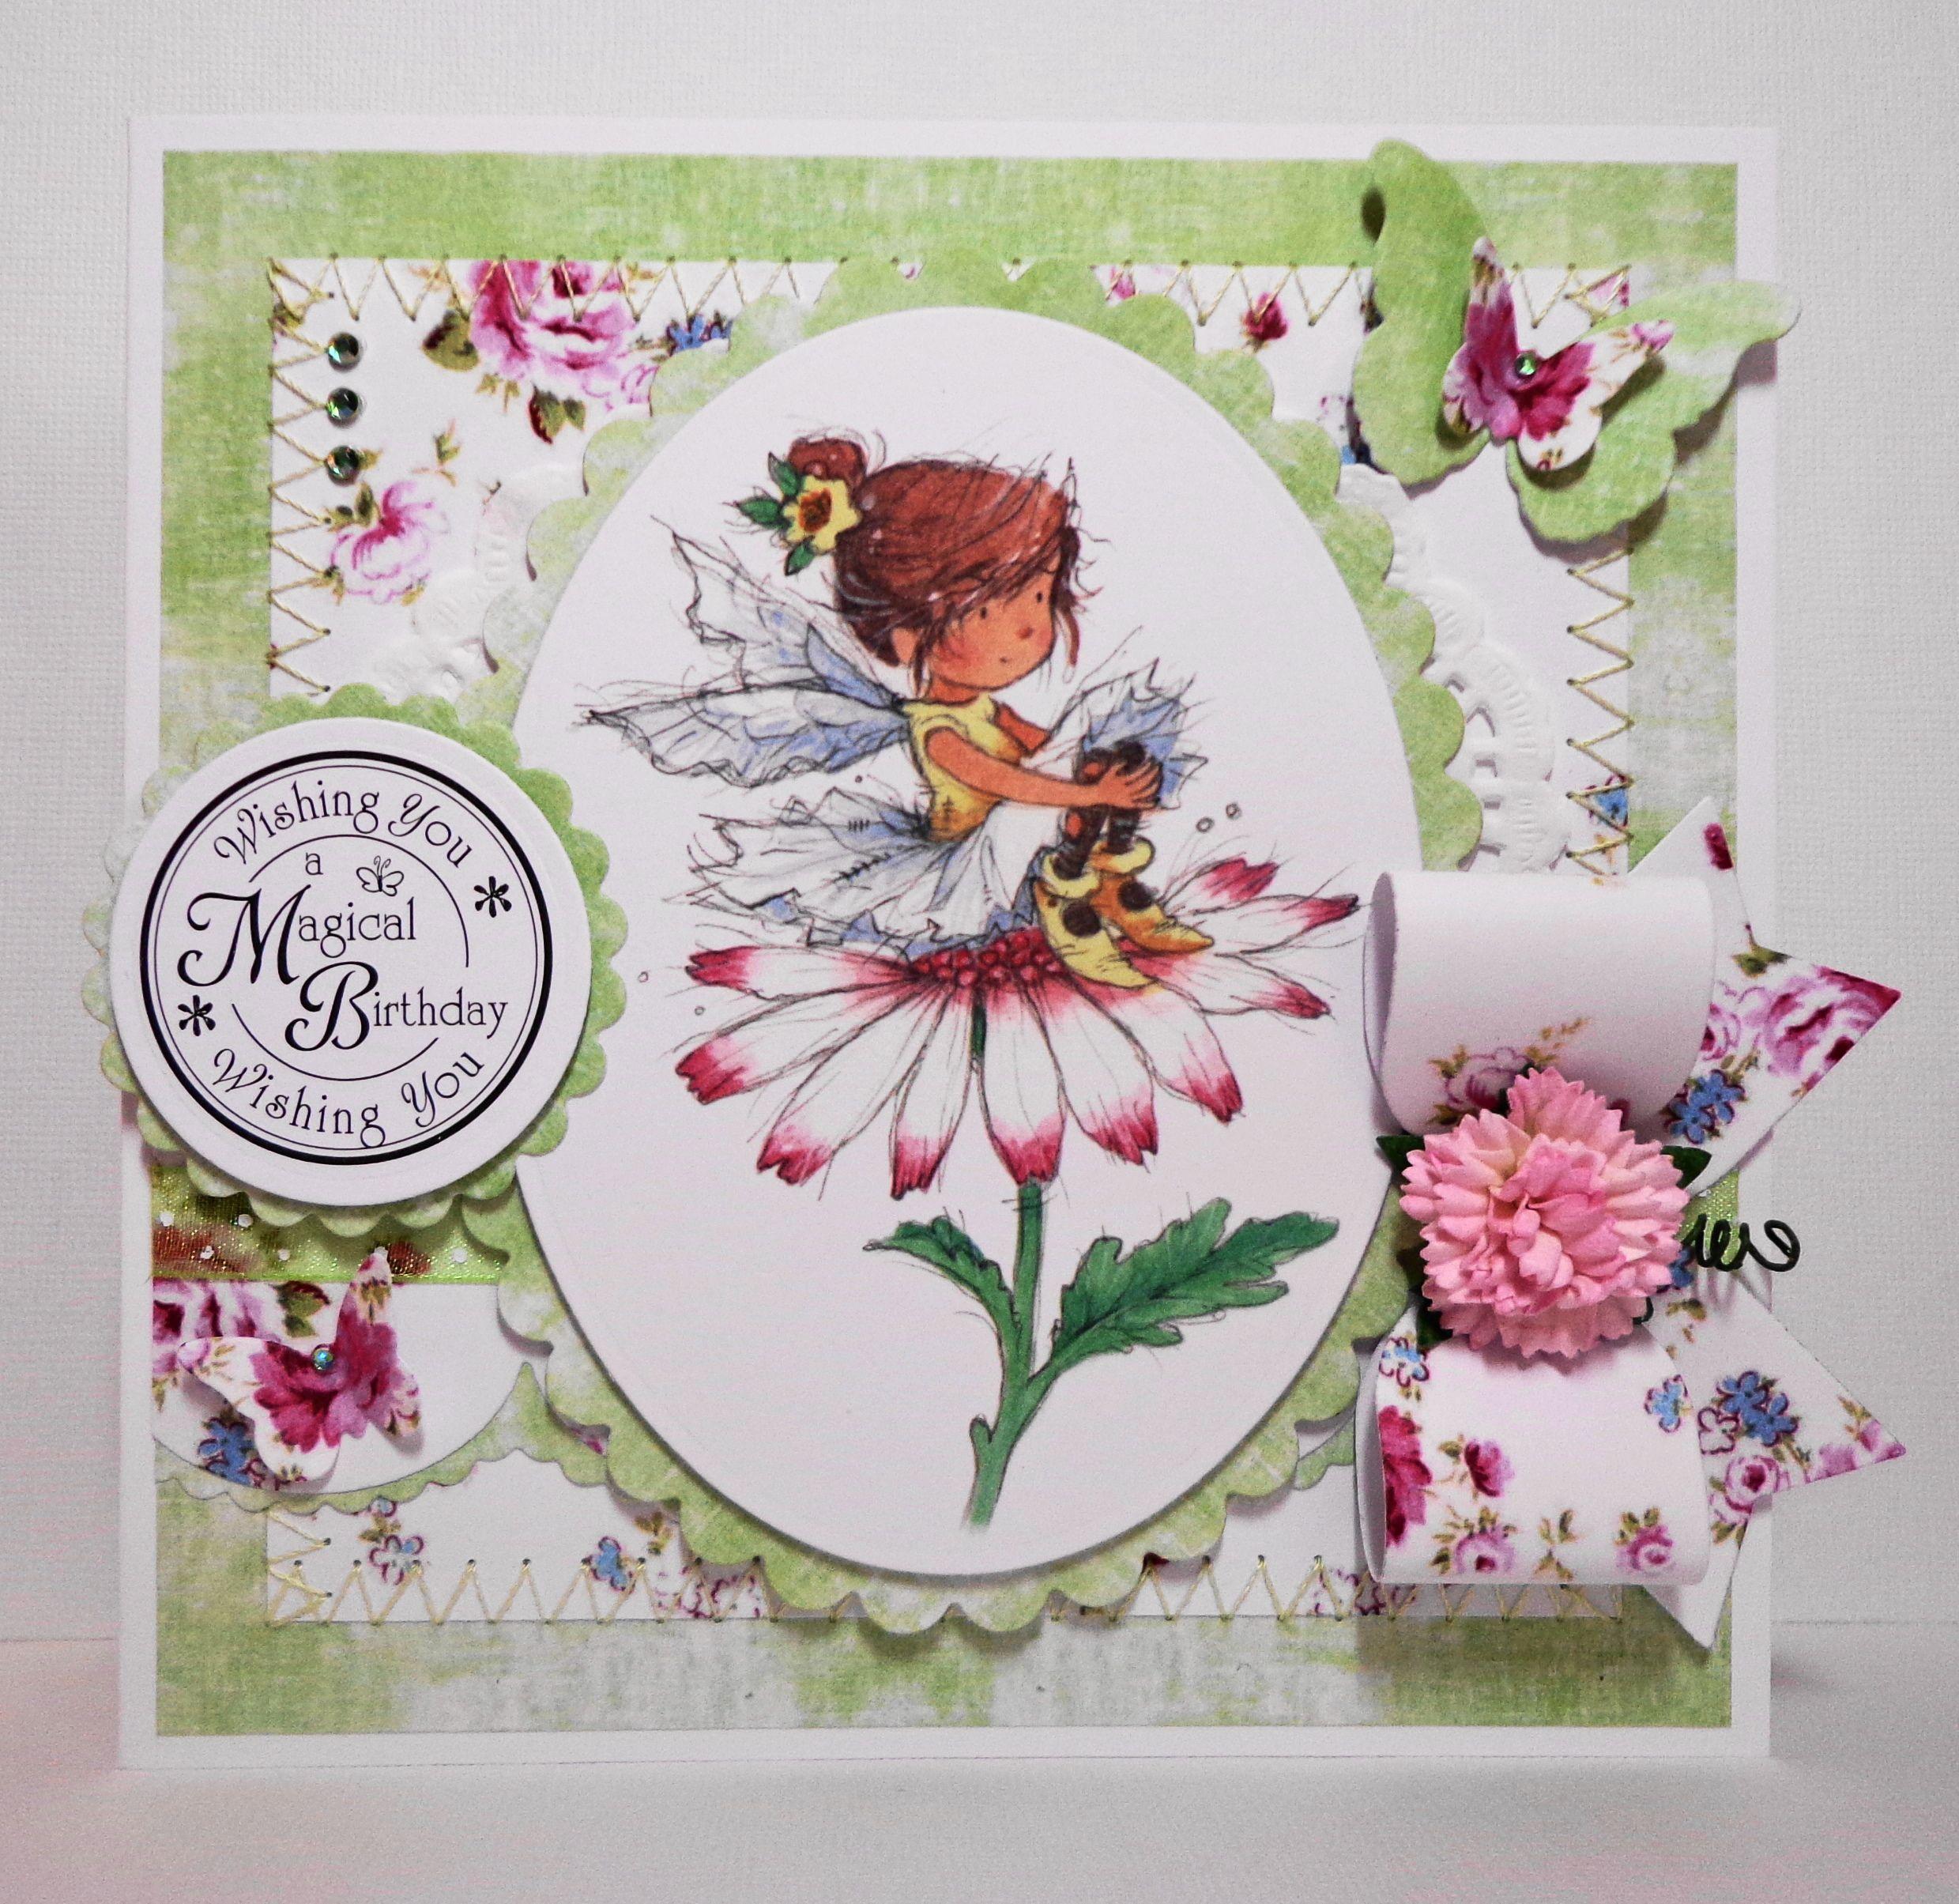 LOTV - Magical Fairies Art Pad by Amanda Stokes